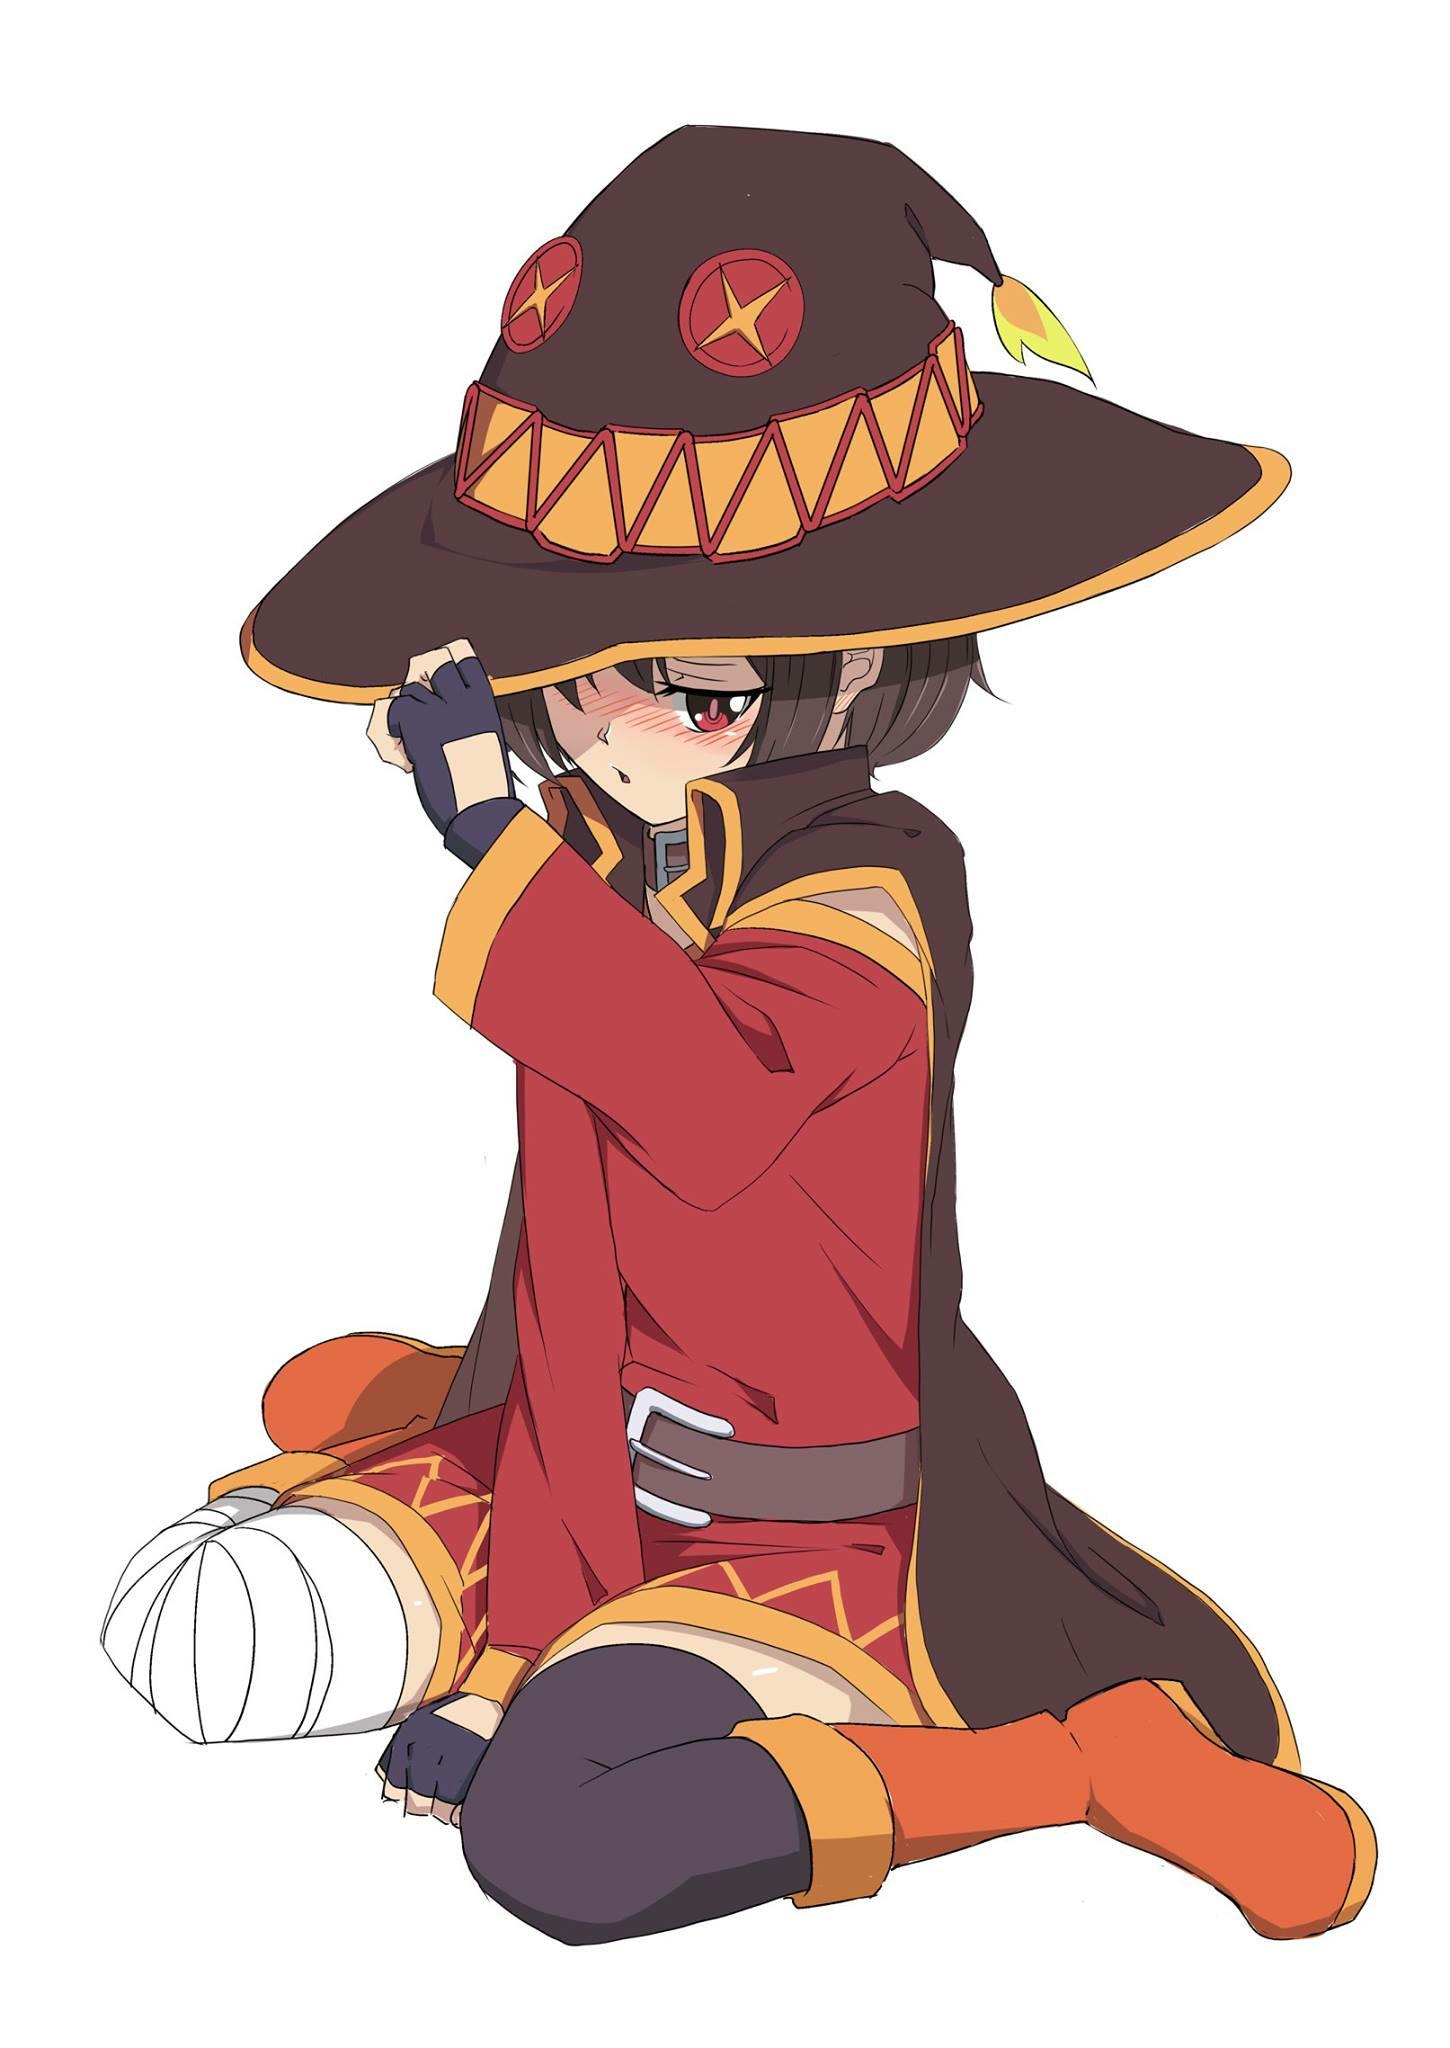 Megumin   Cute   Anime, Kawaii anime, Anime art